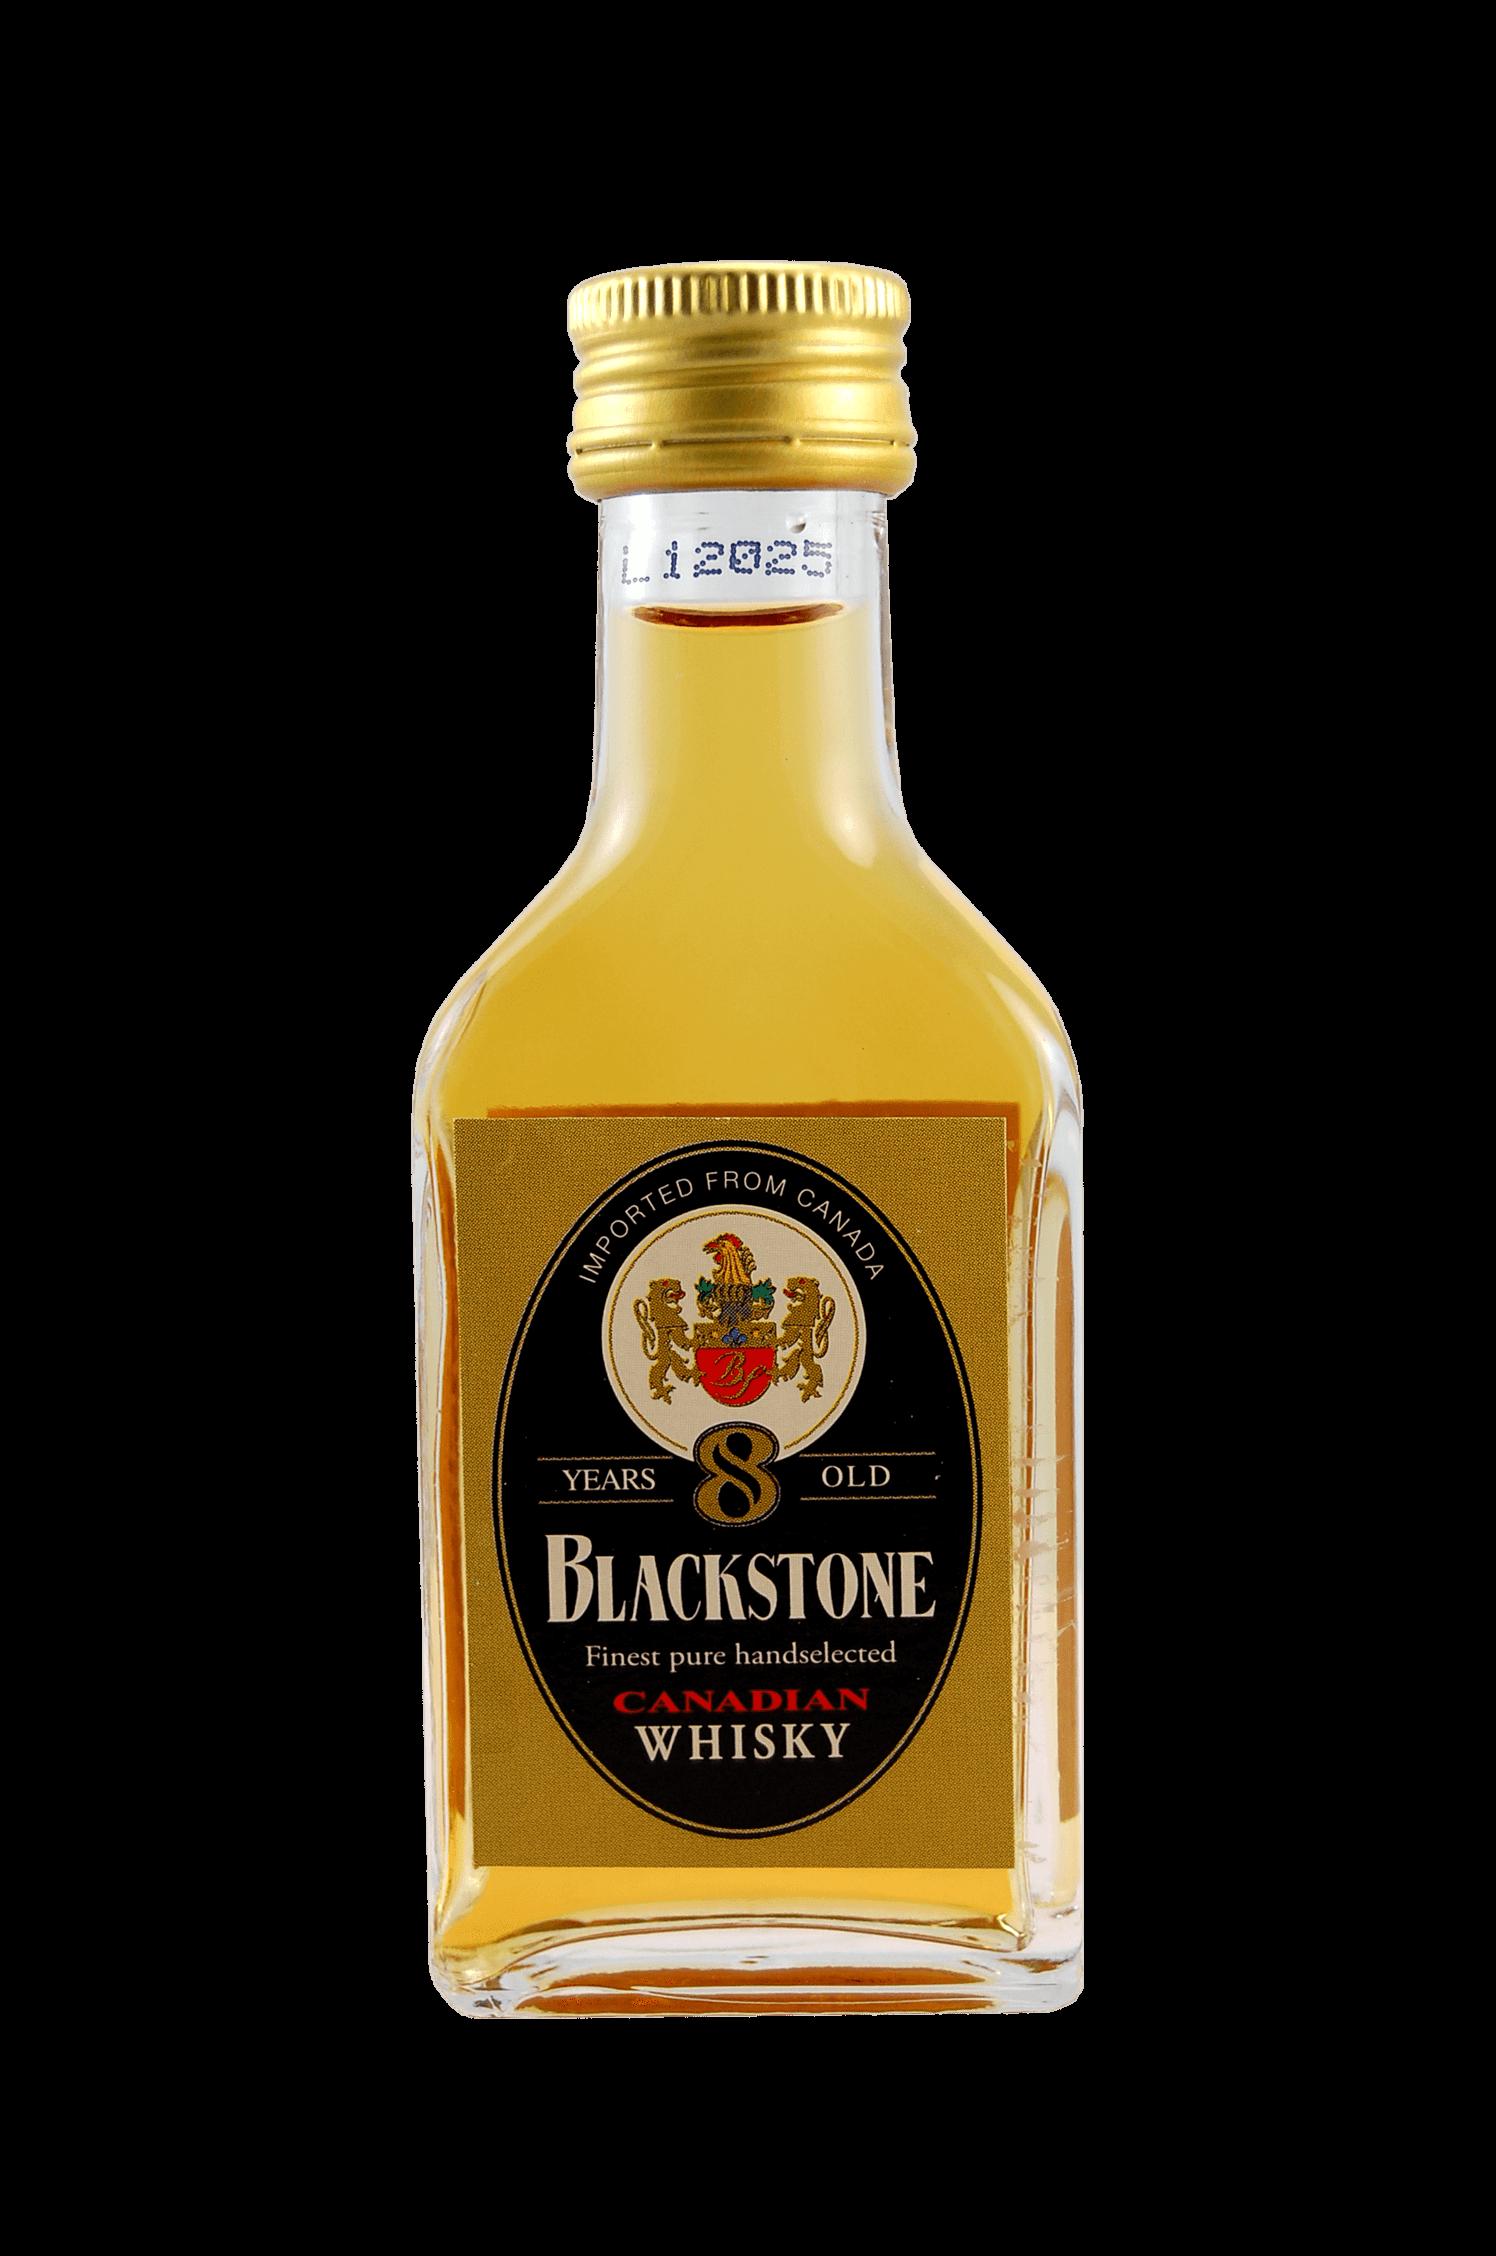 Blackstone Canadian Whisky